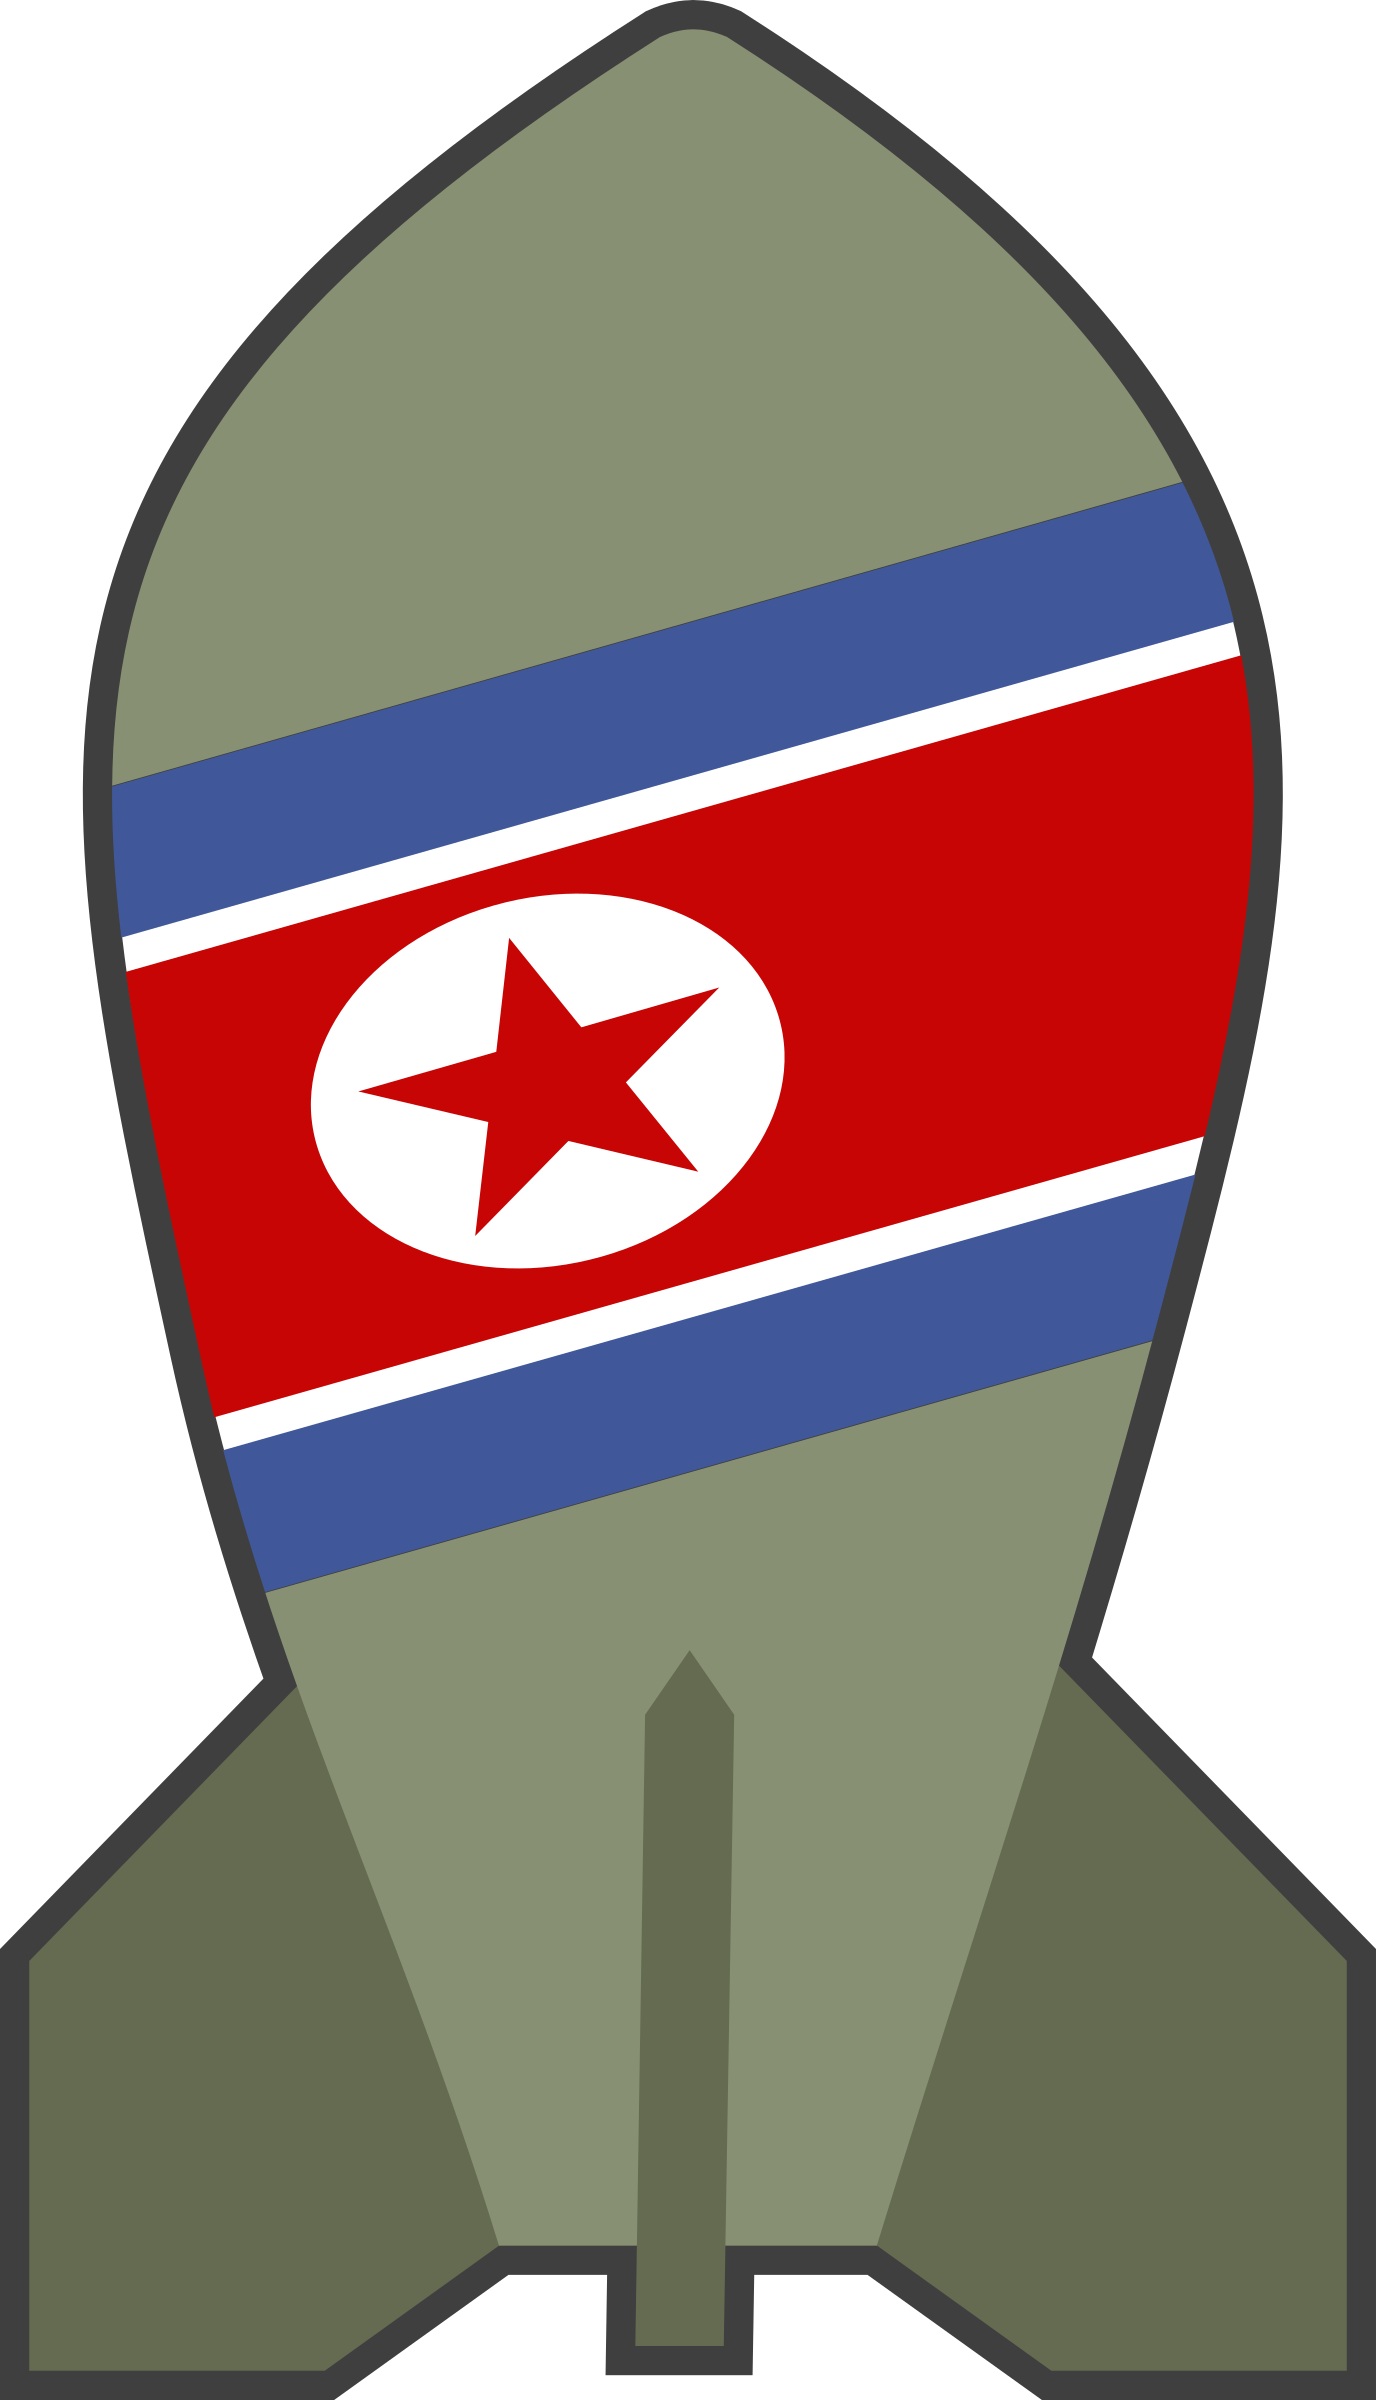 graphic black and white stock Simple cartoon north korea. Wars clipart war bomb